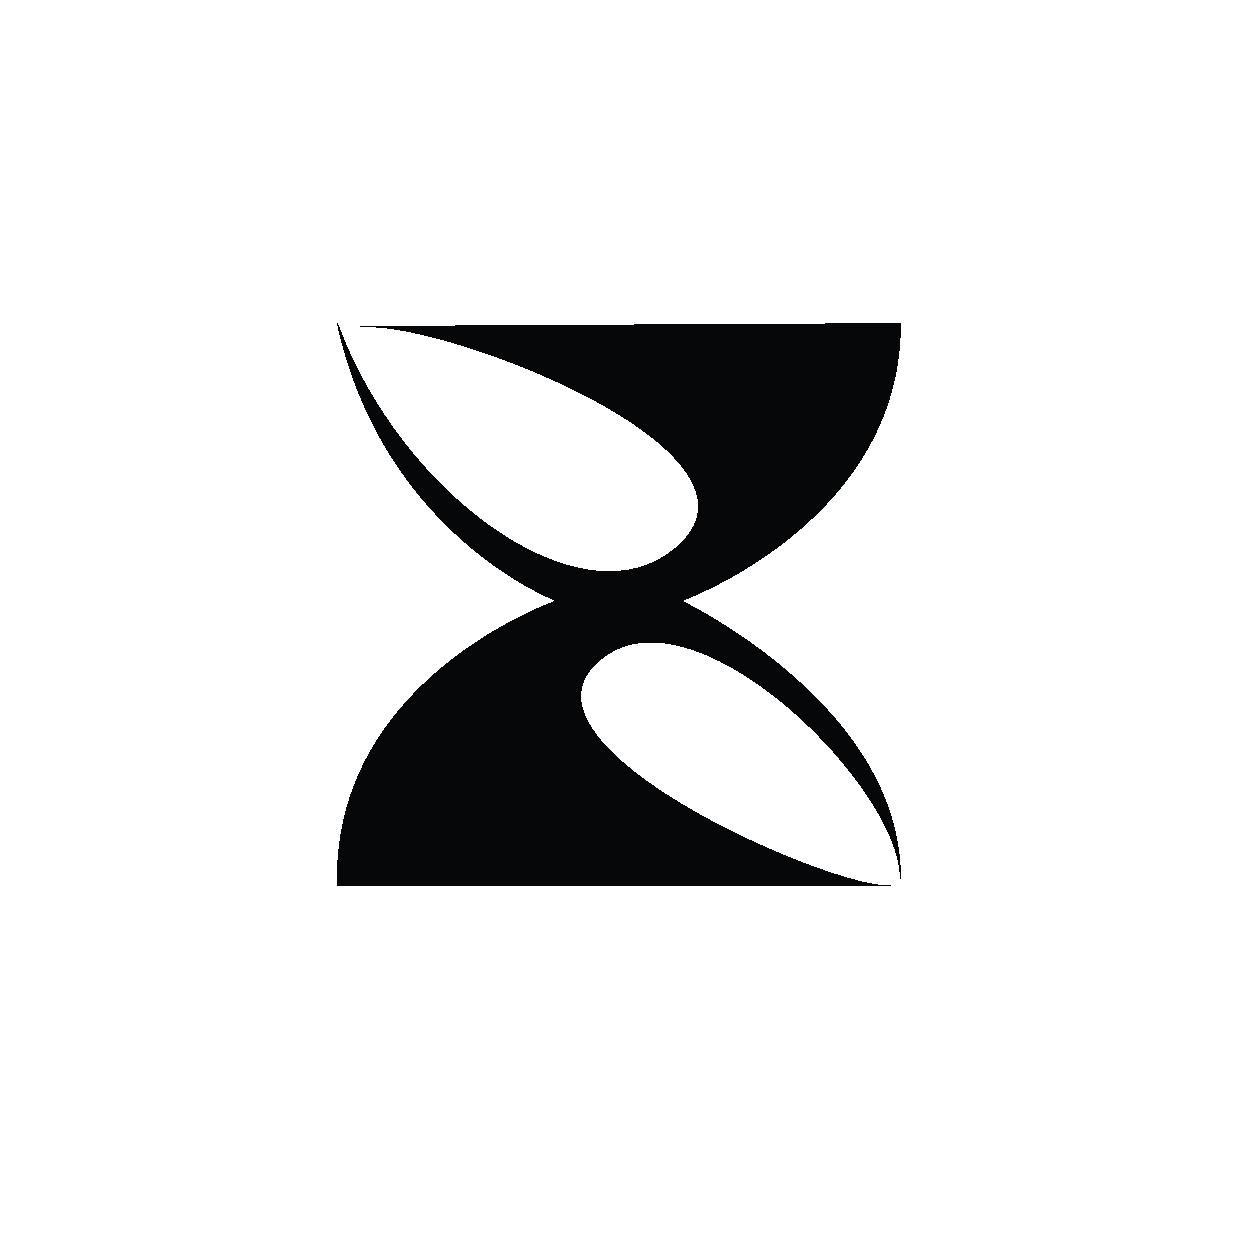 Static_aa-zz-06